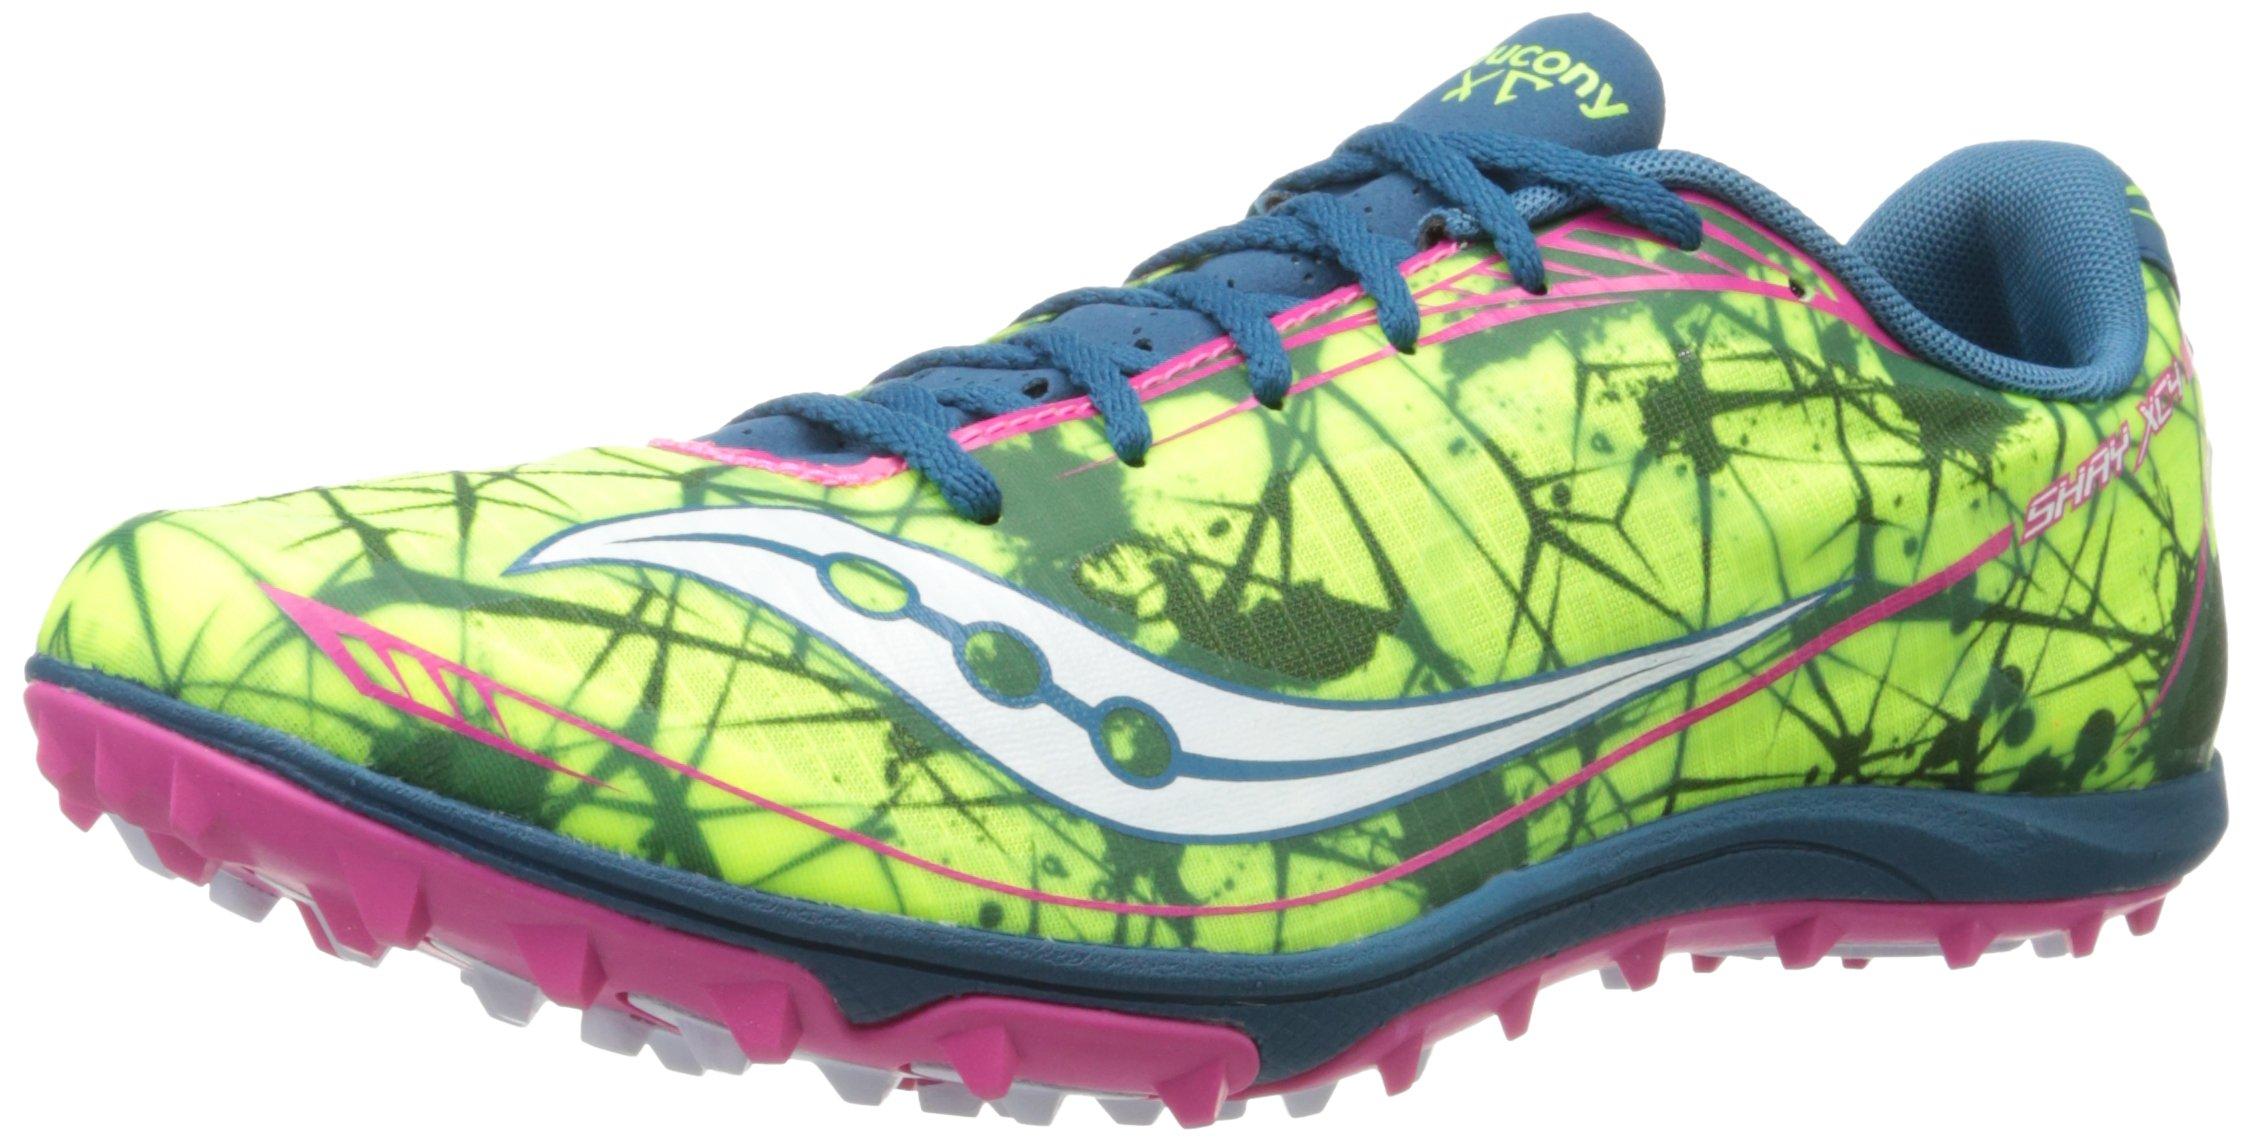 Saucony Women's Shay XC4 Flat Cross Country Flat Shoe